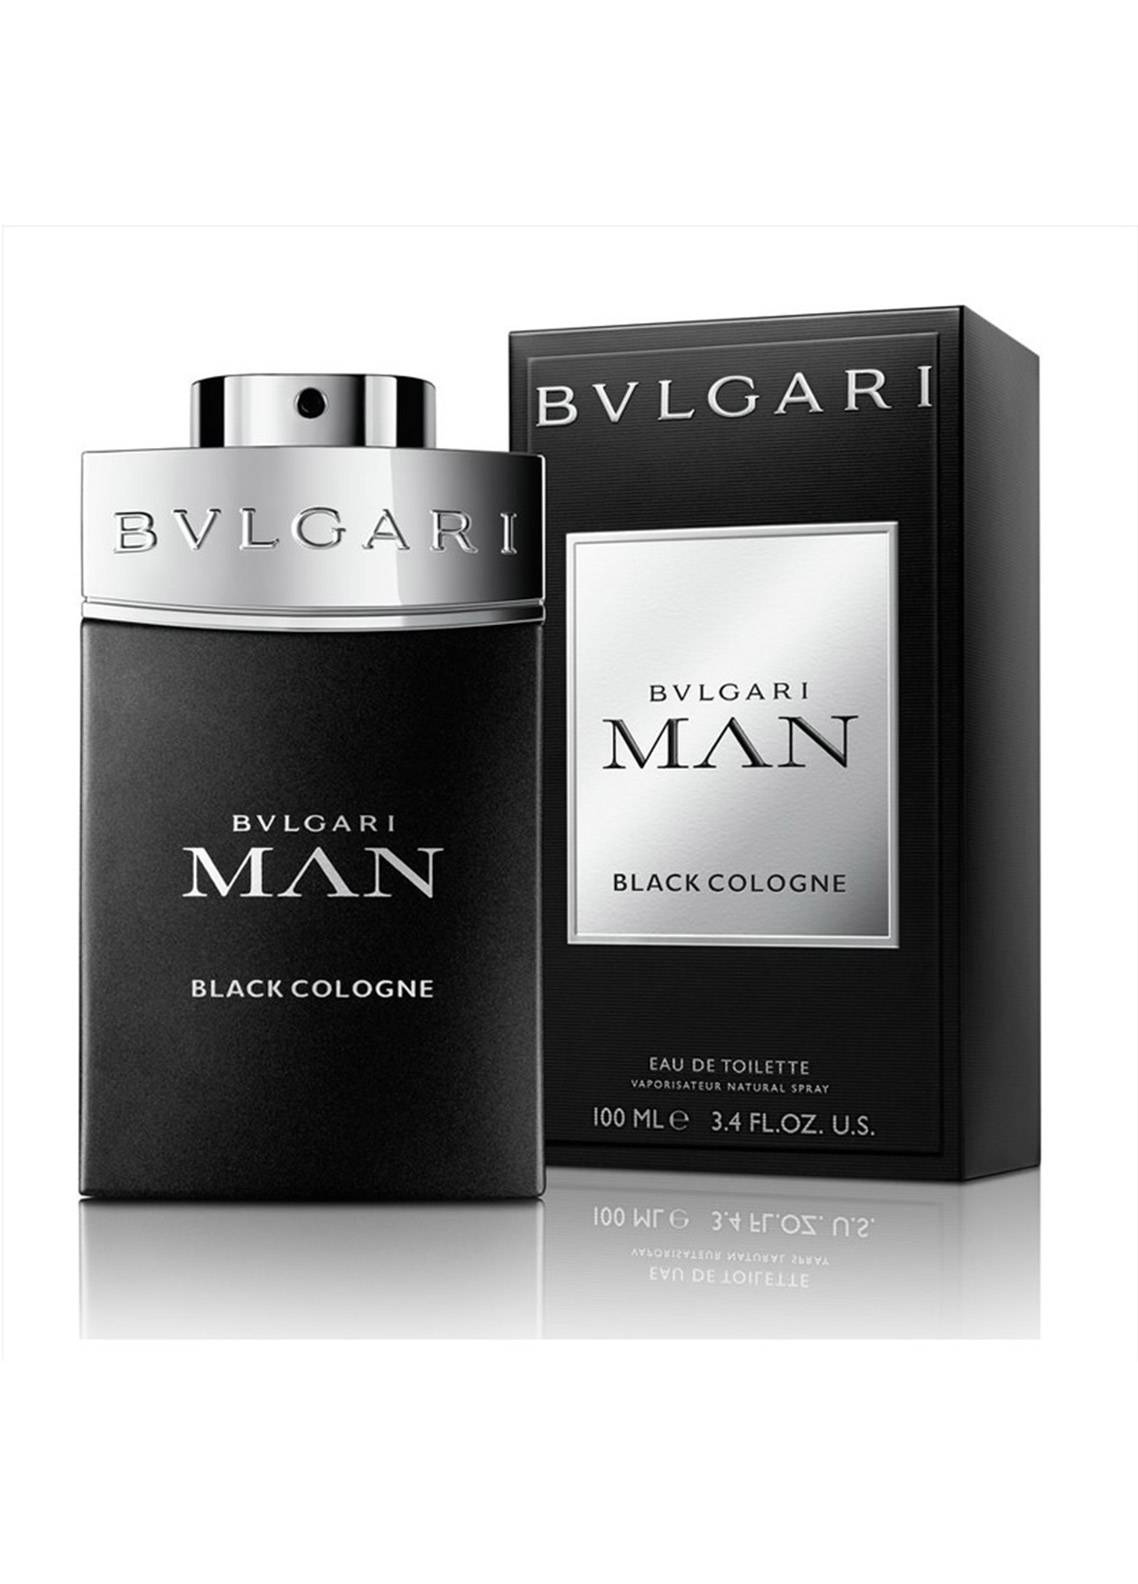 Bvlgari Perfumes Bvlgari Perfumes For Men Women In Pakistan